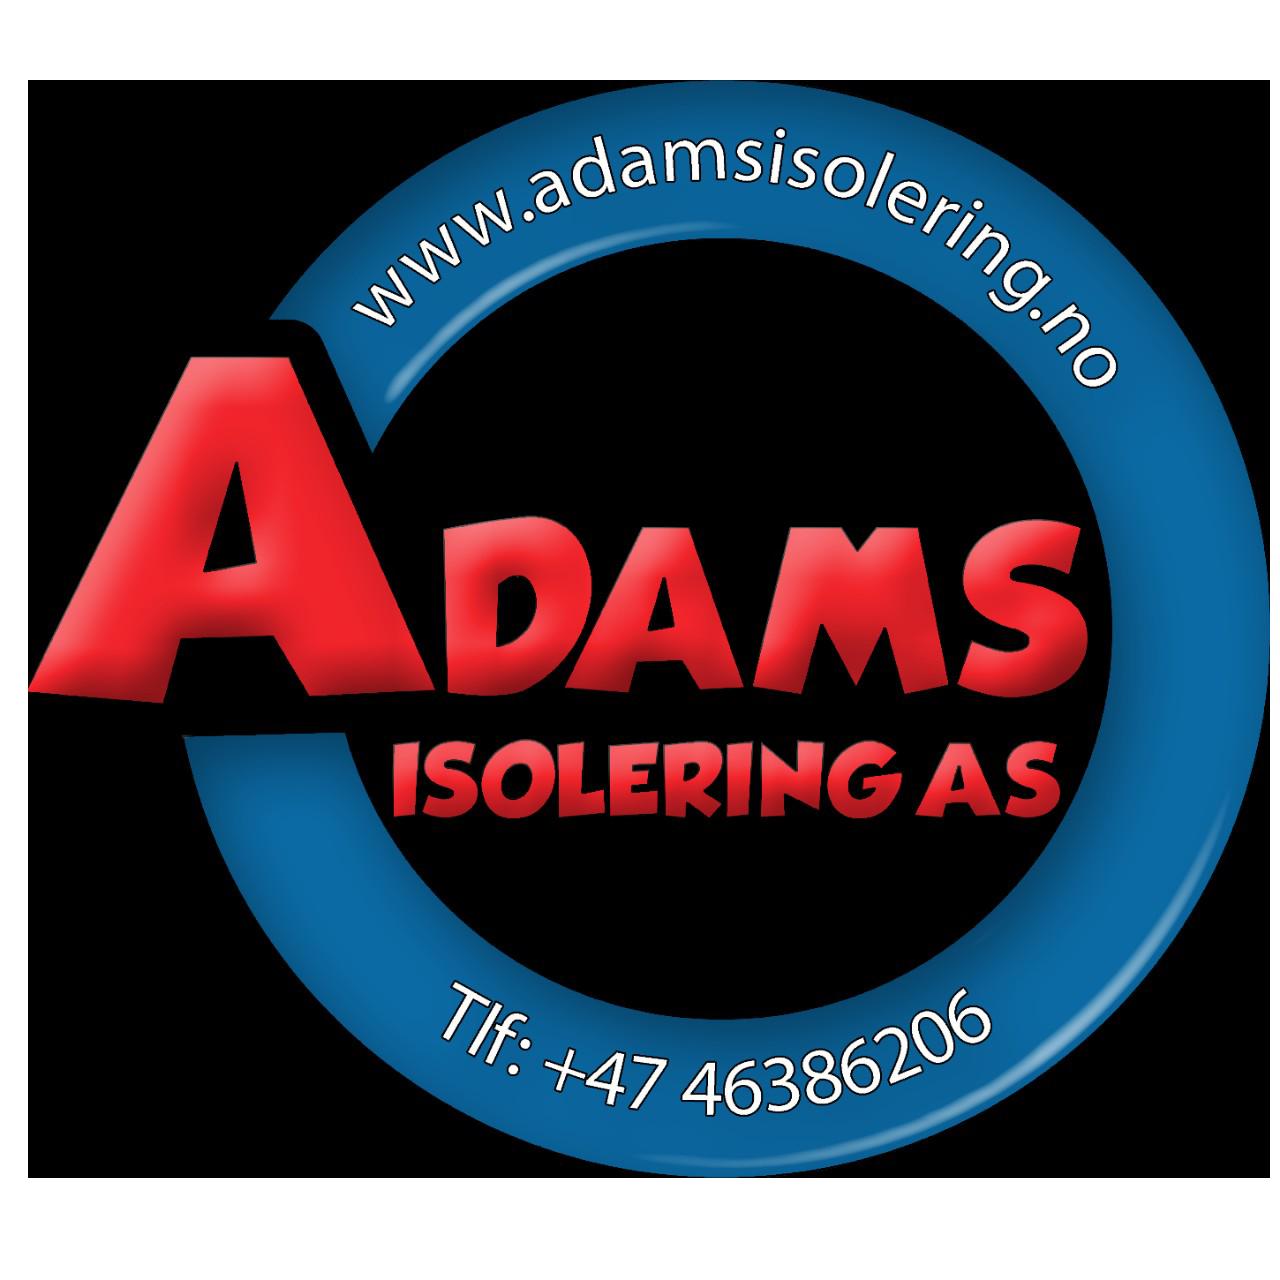 Adams Isolering